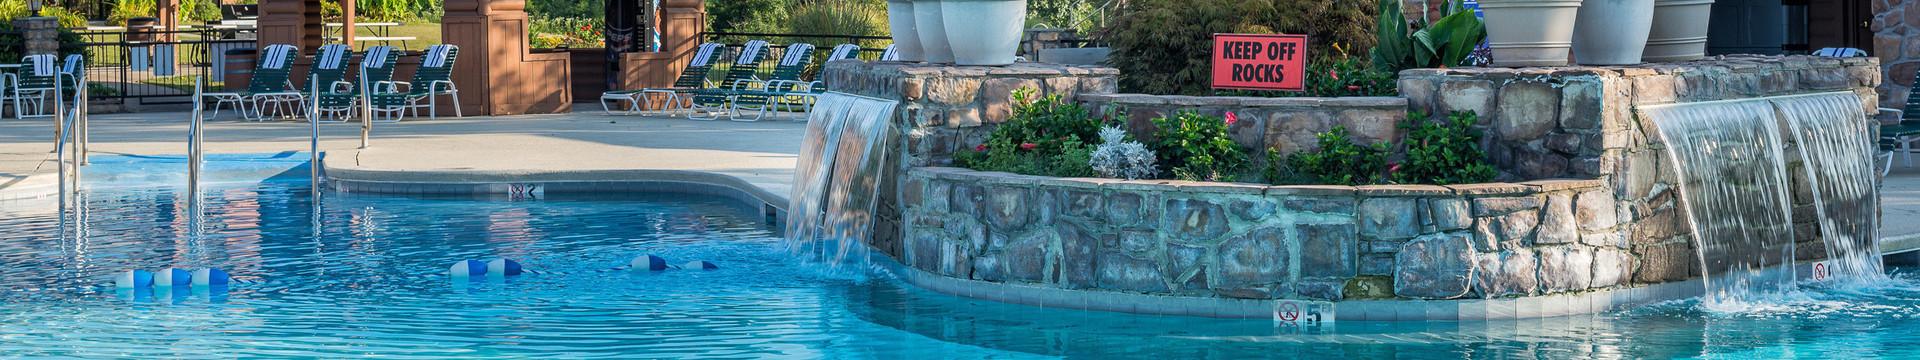 Branson Hotel Deals and Discounts - Westgate Branson Woods Resort